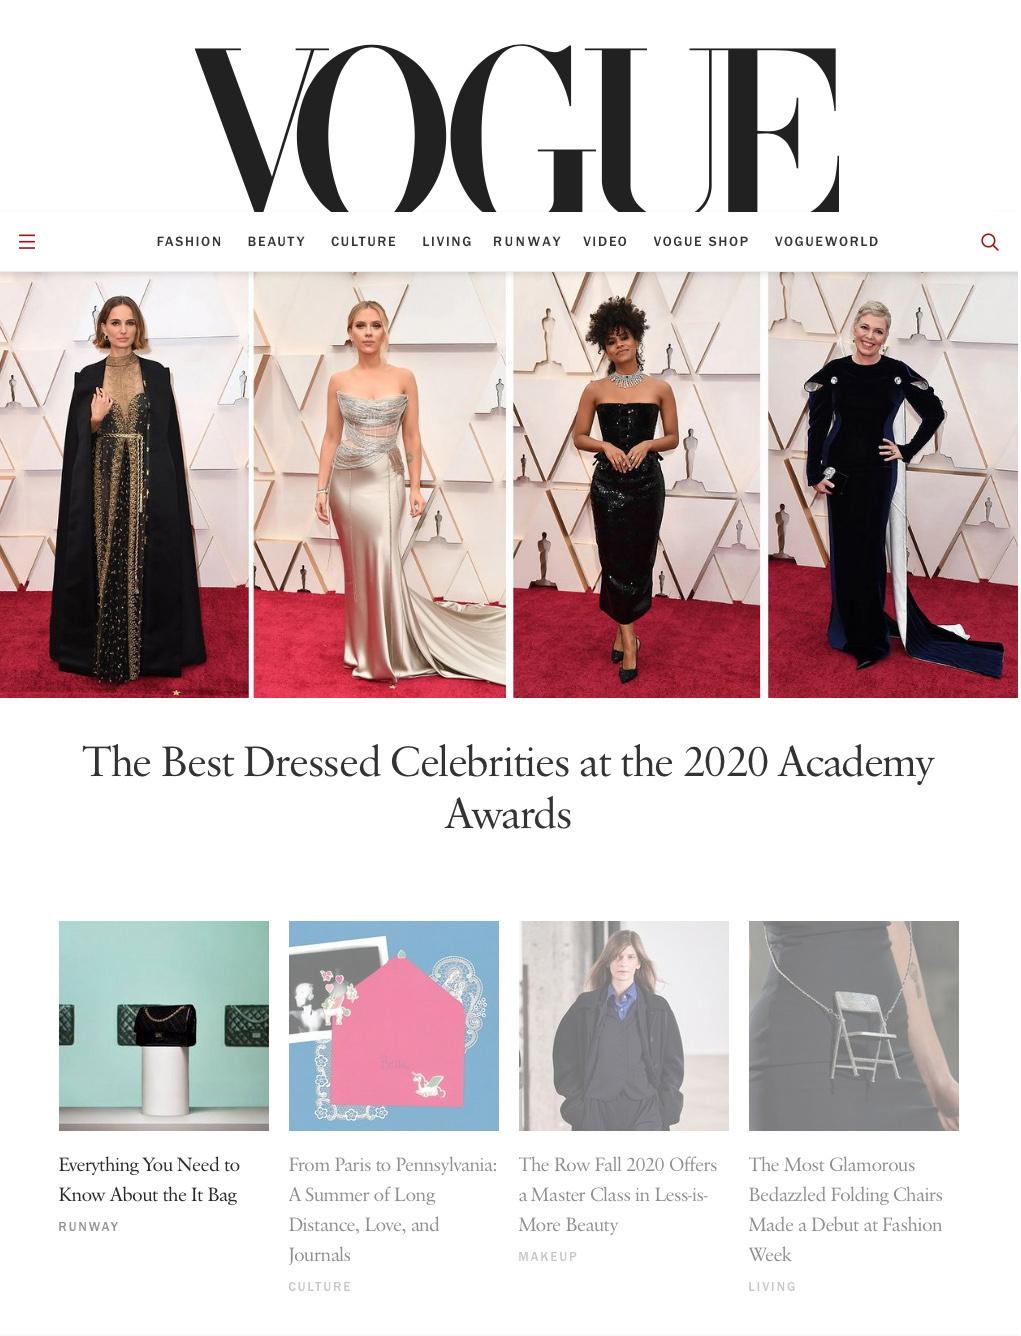 Vogue TheItBag press02b Andrew Meyers Hornet